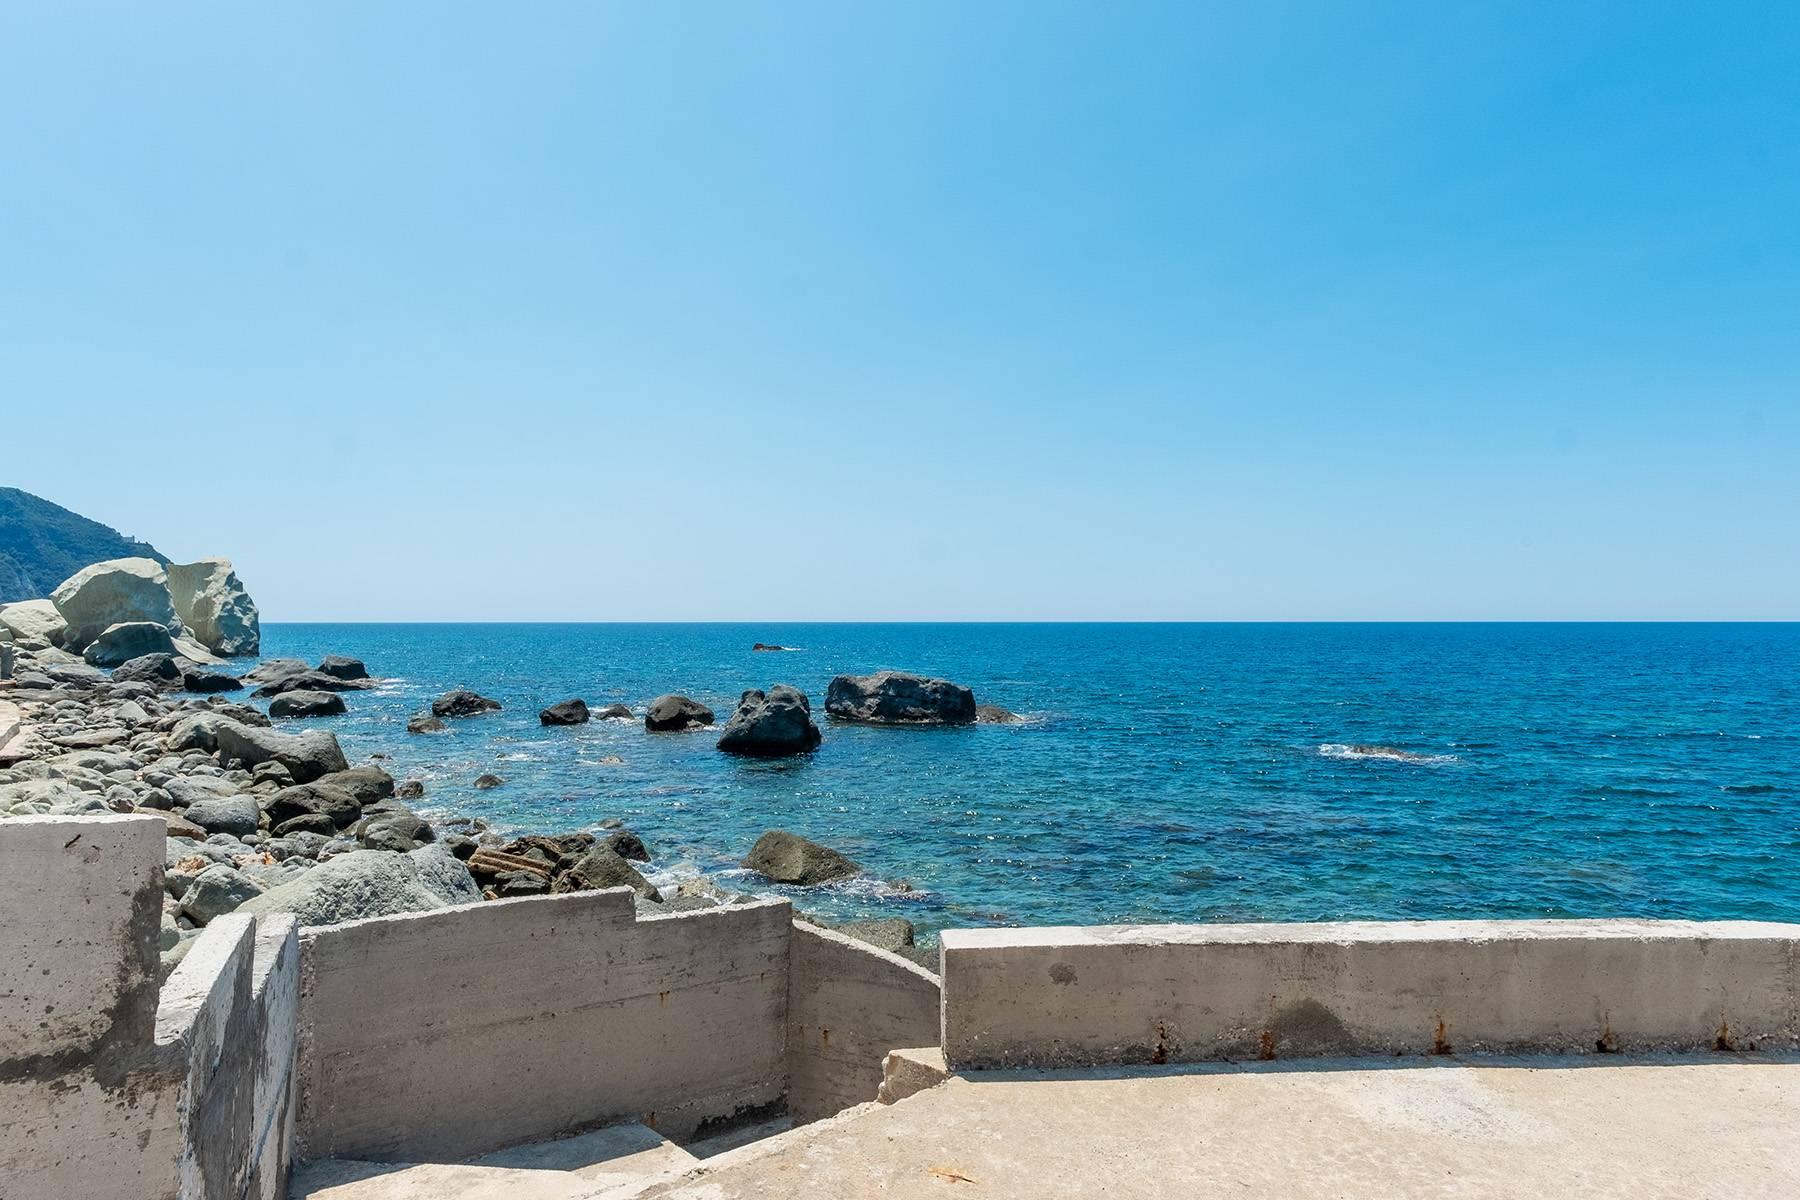 Villa in Vendita a Ischia: 5 locali, 400 mq - Foto 15